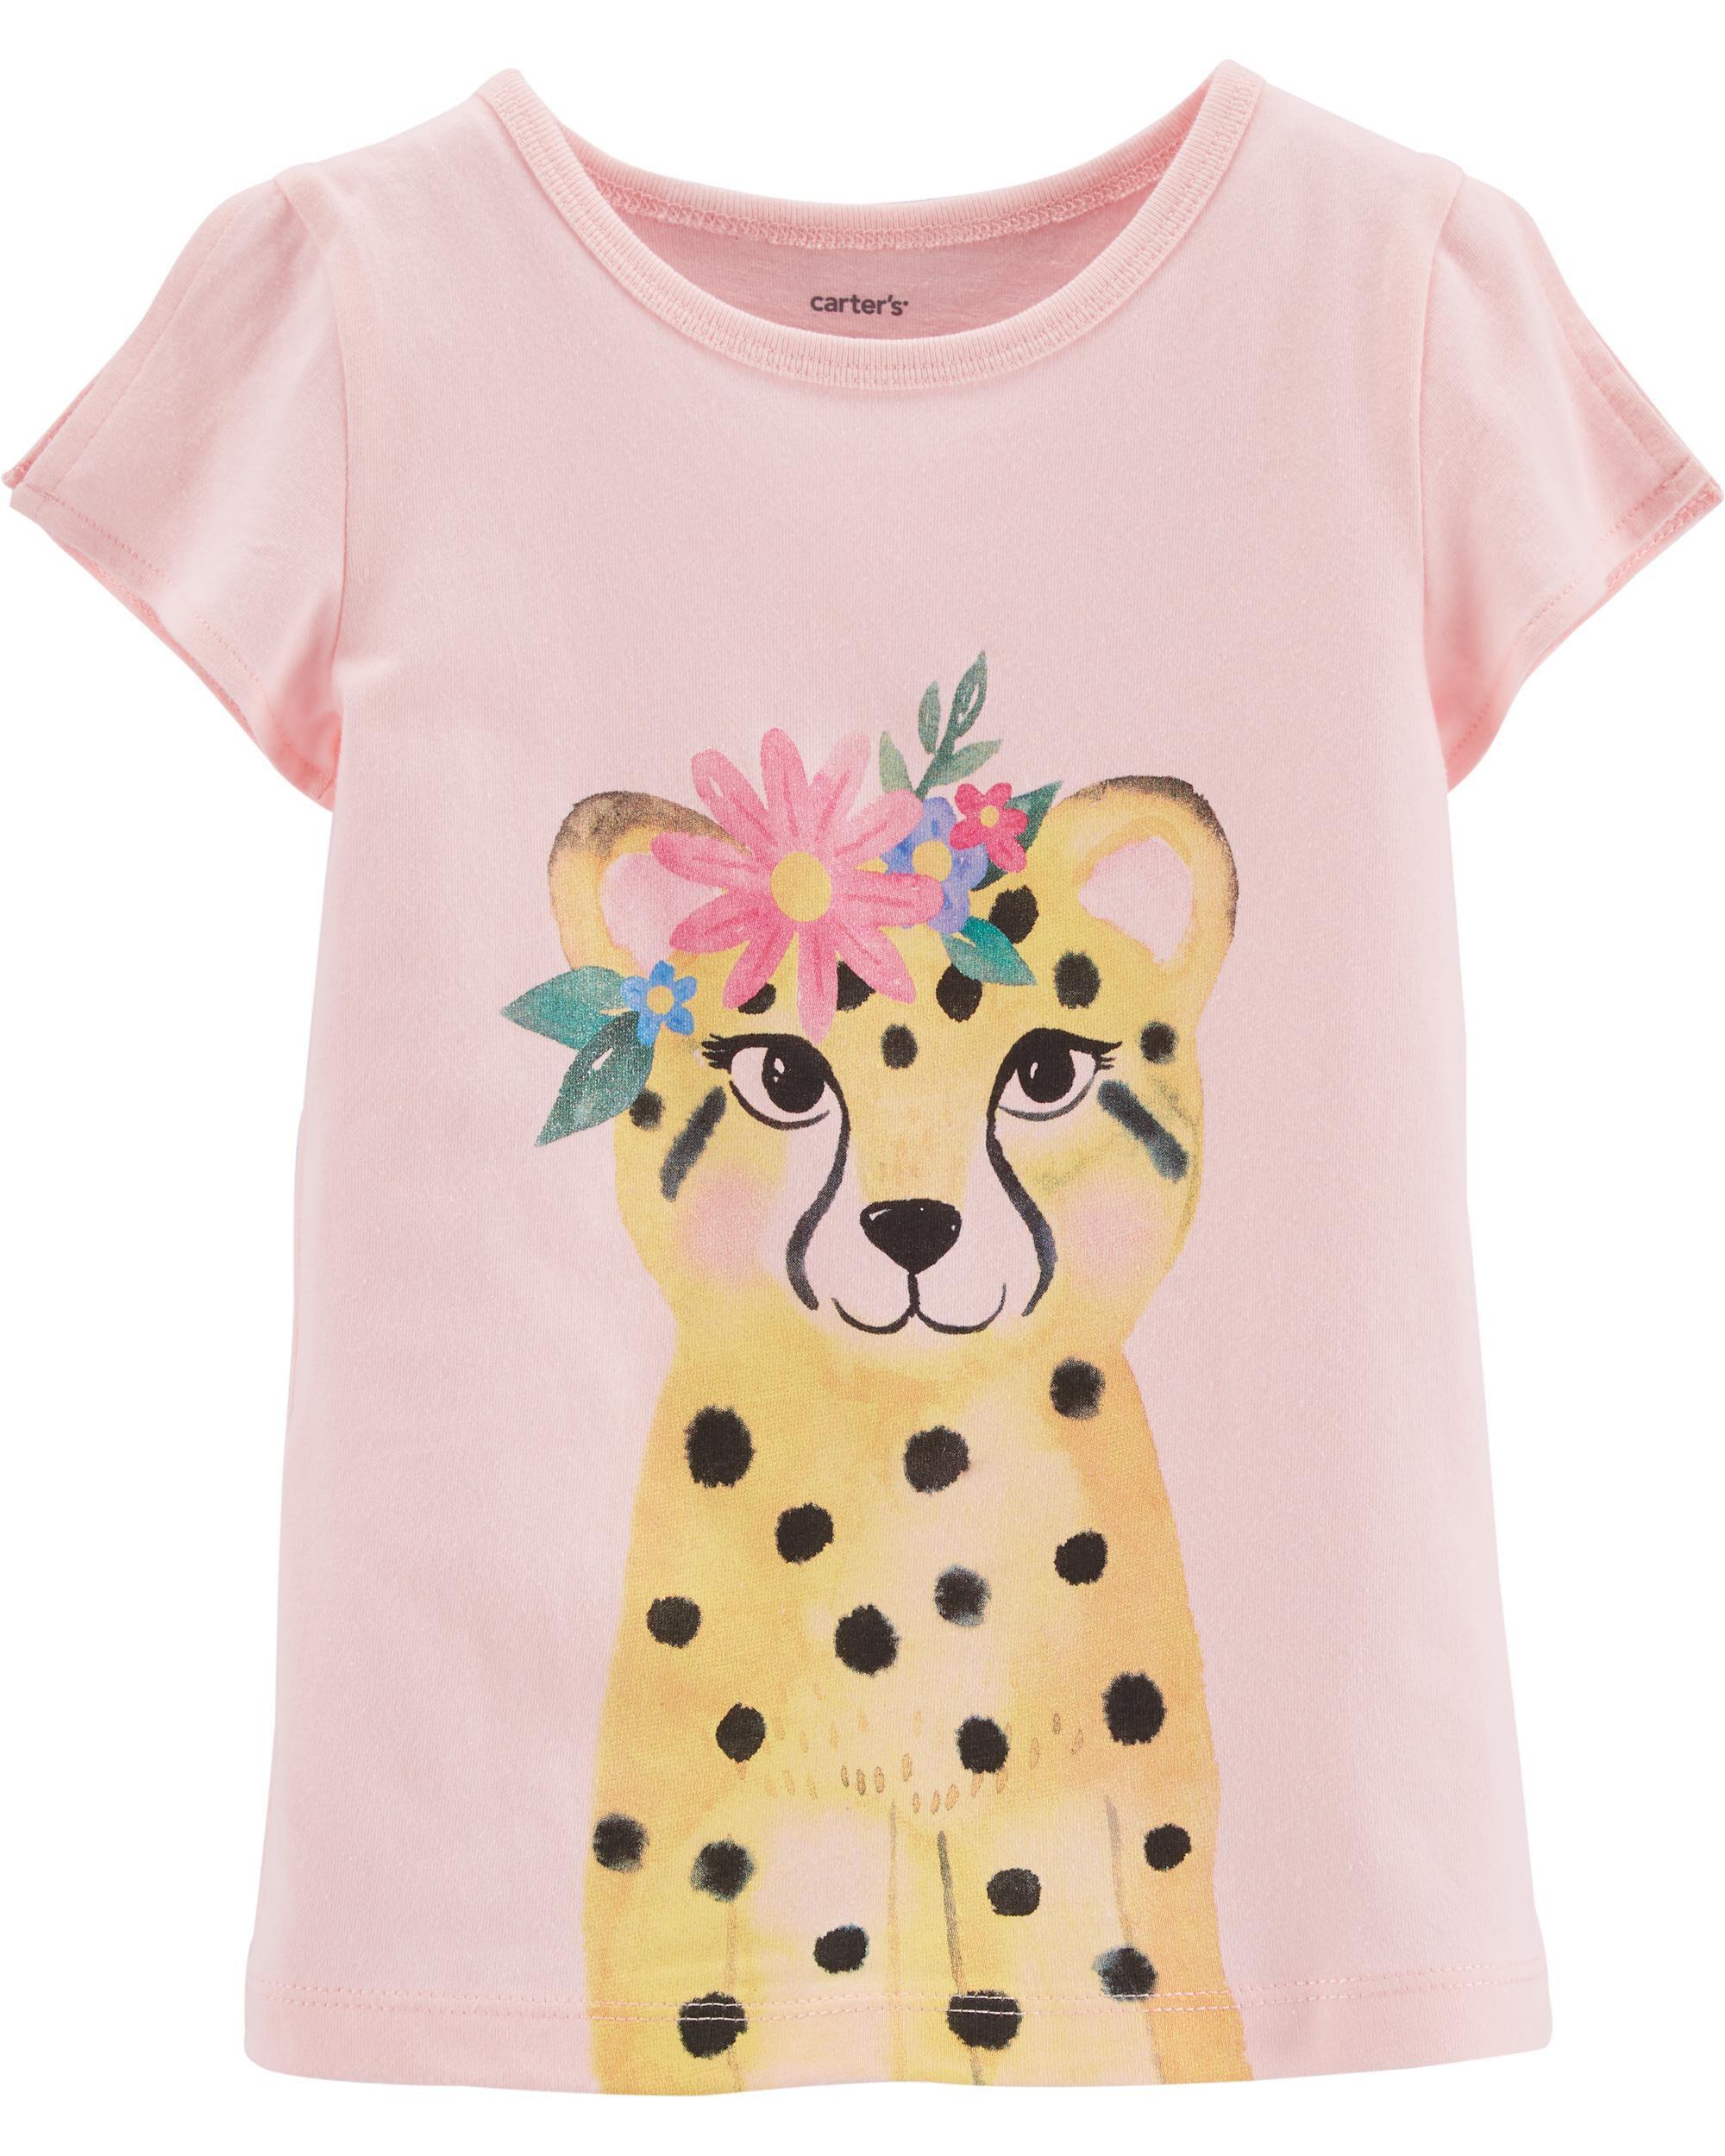 2T, Pink Carters Little Girls Raglan Graphic Tee 4 Ever